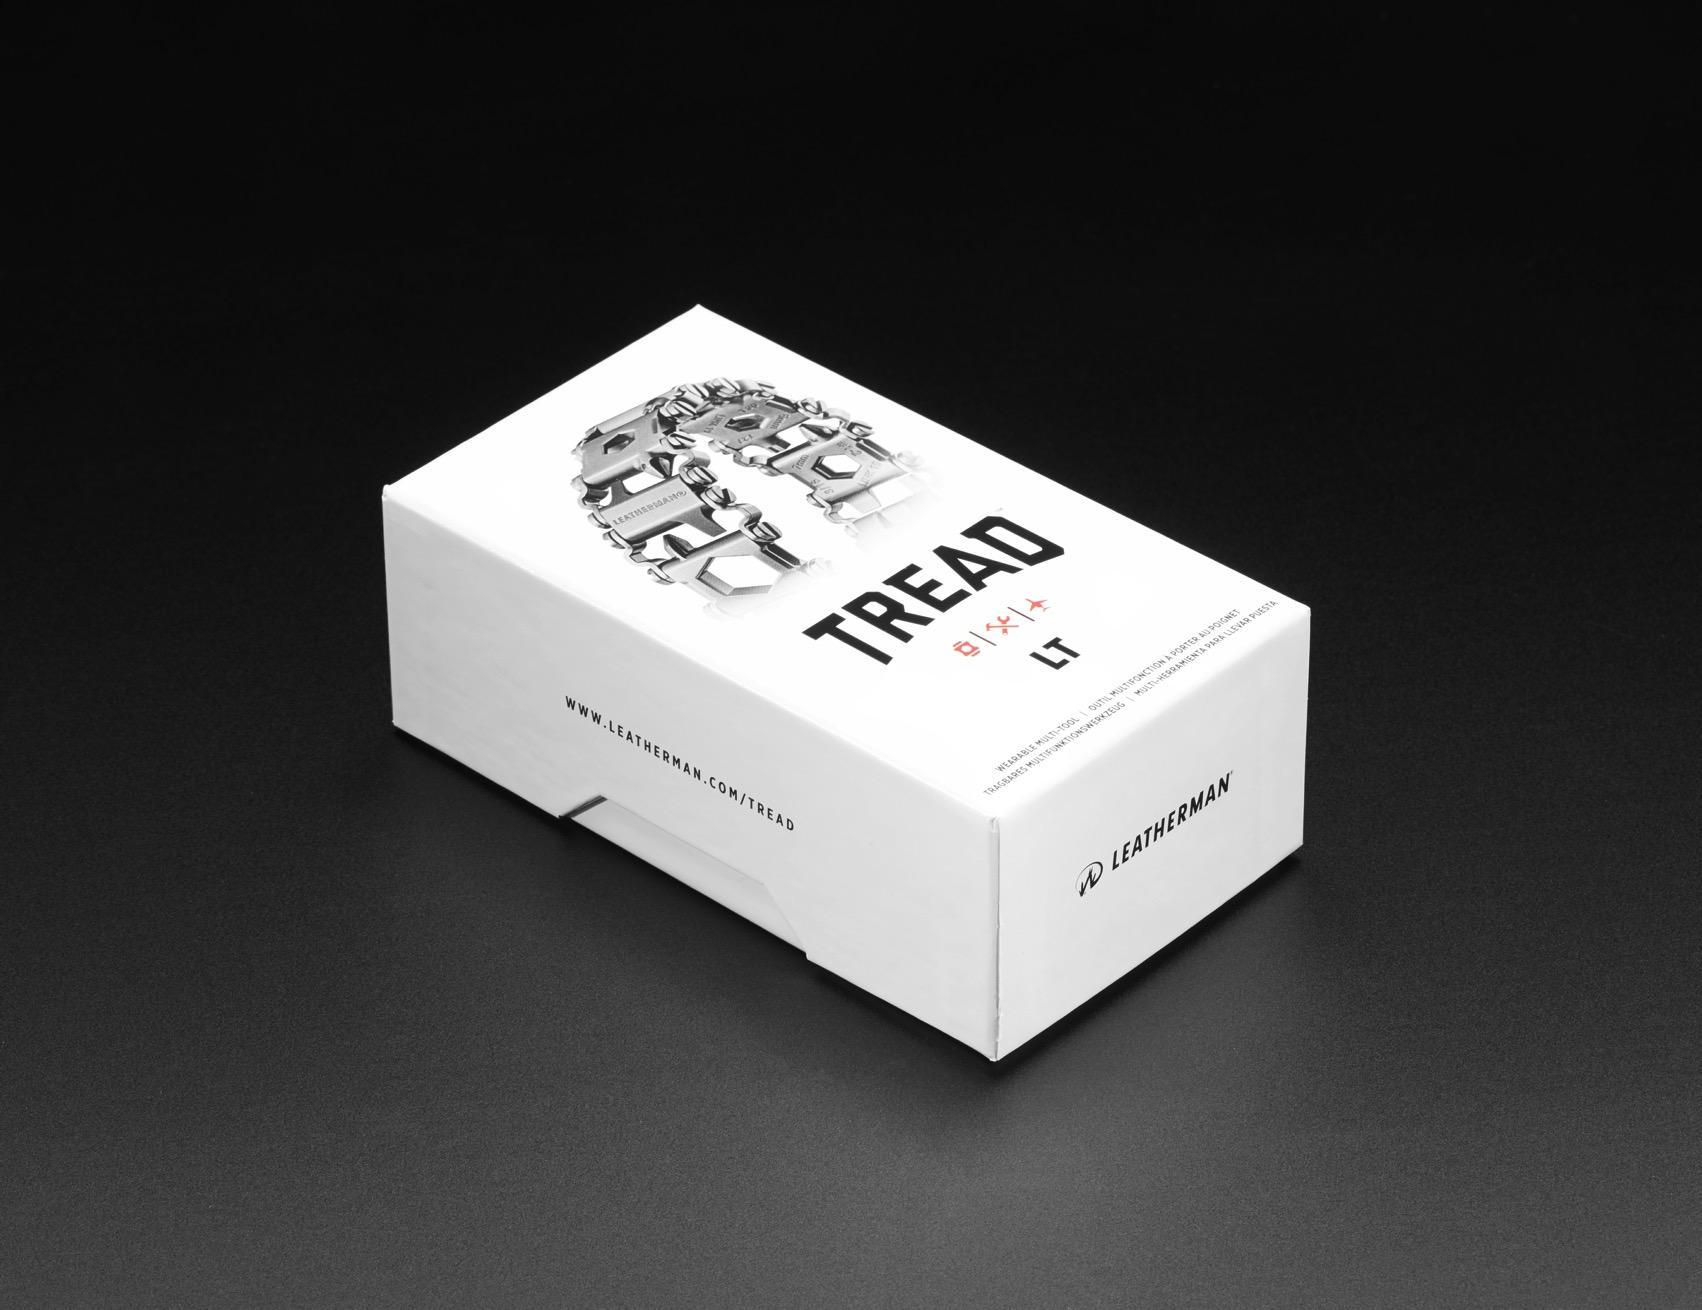 3676 iso box 01 ORIG 2017 11